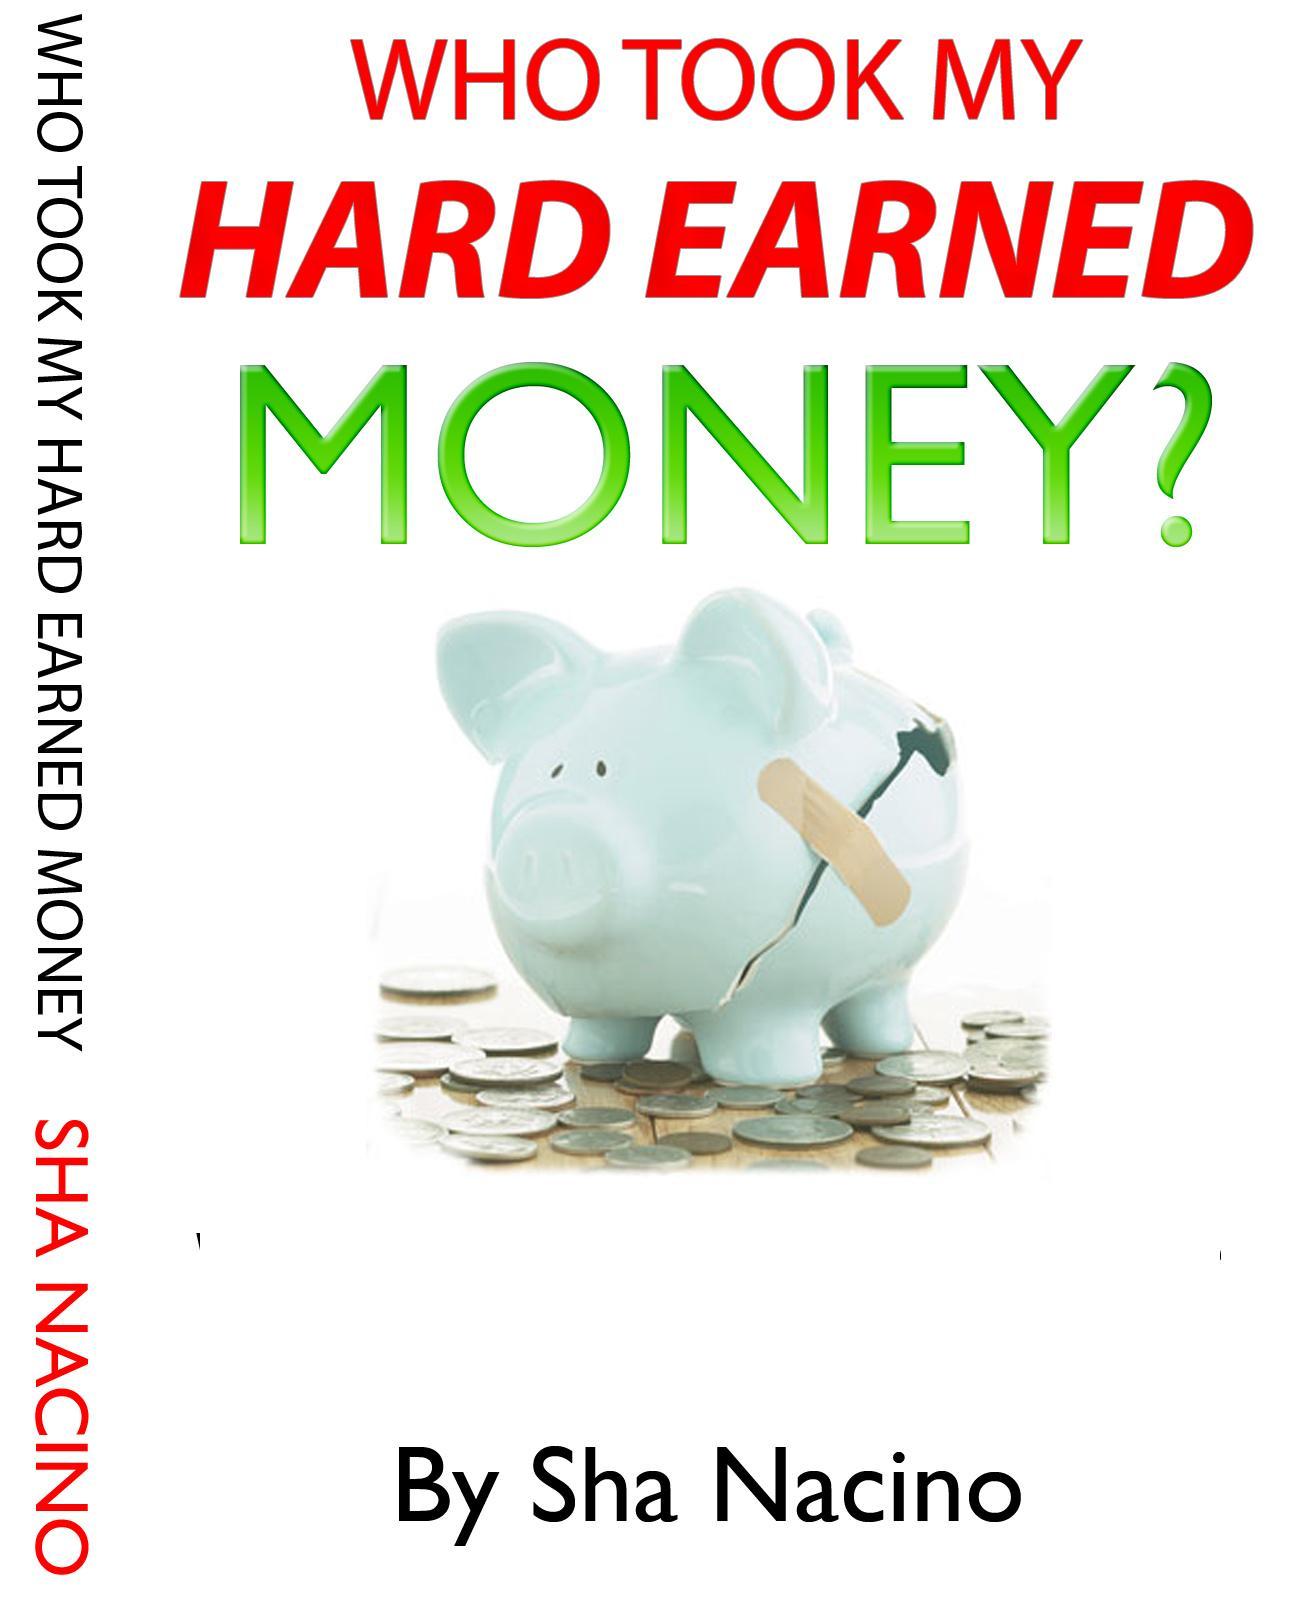 Who Took My Hard-Earned Money, Sha Nacino